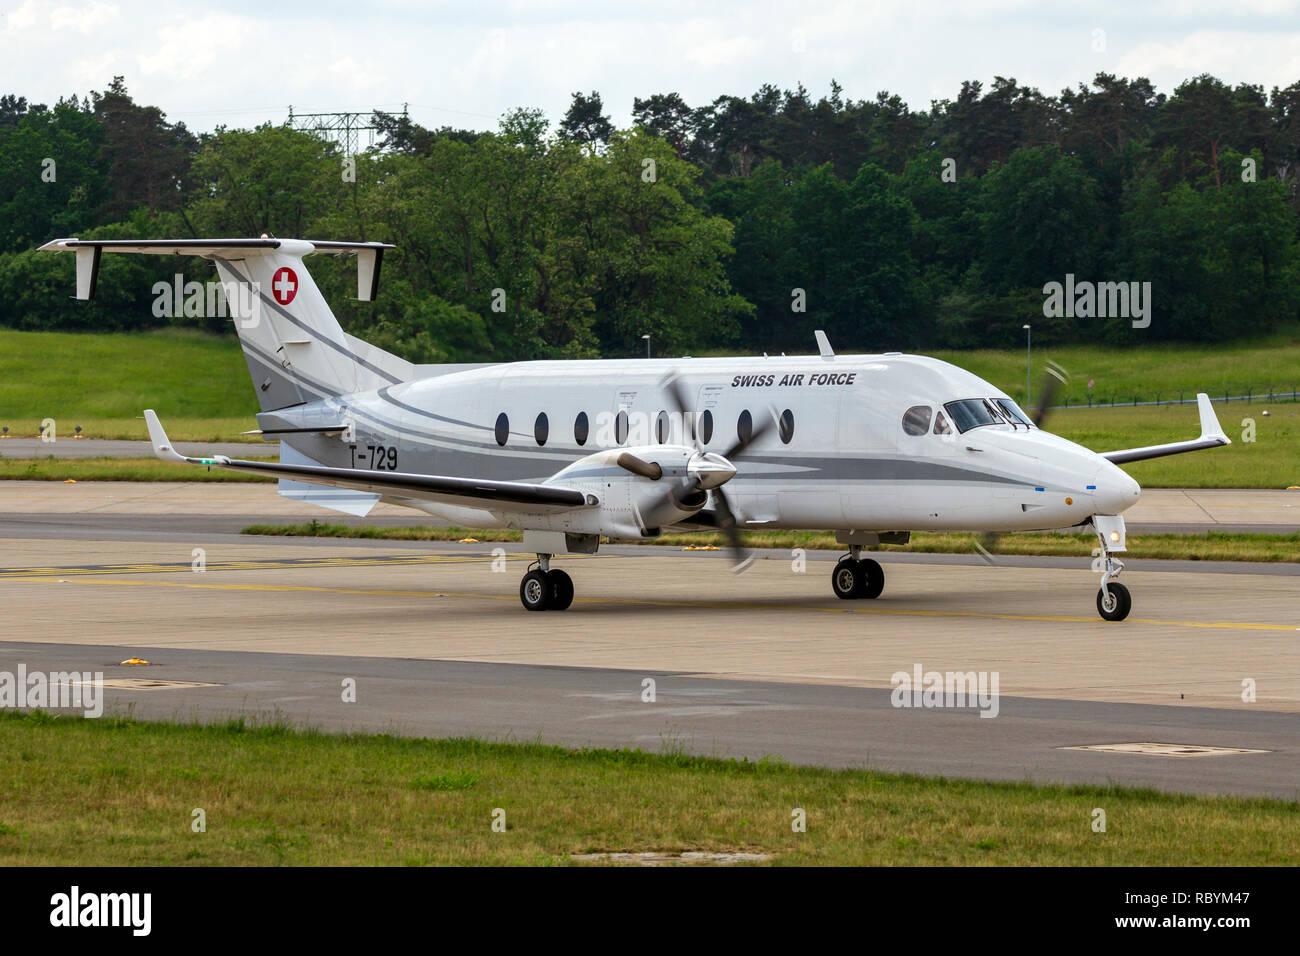 BERLIN, GERMANY - JUNE 2, 2016: Swiss Air Force Beech 1900D VIP transport plane taxiing after landing on Berlin-Schonefeld airport. - Stock Image